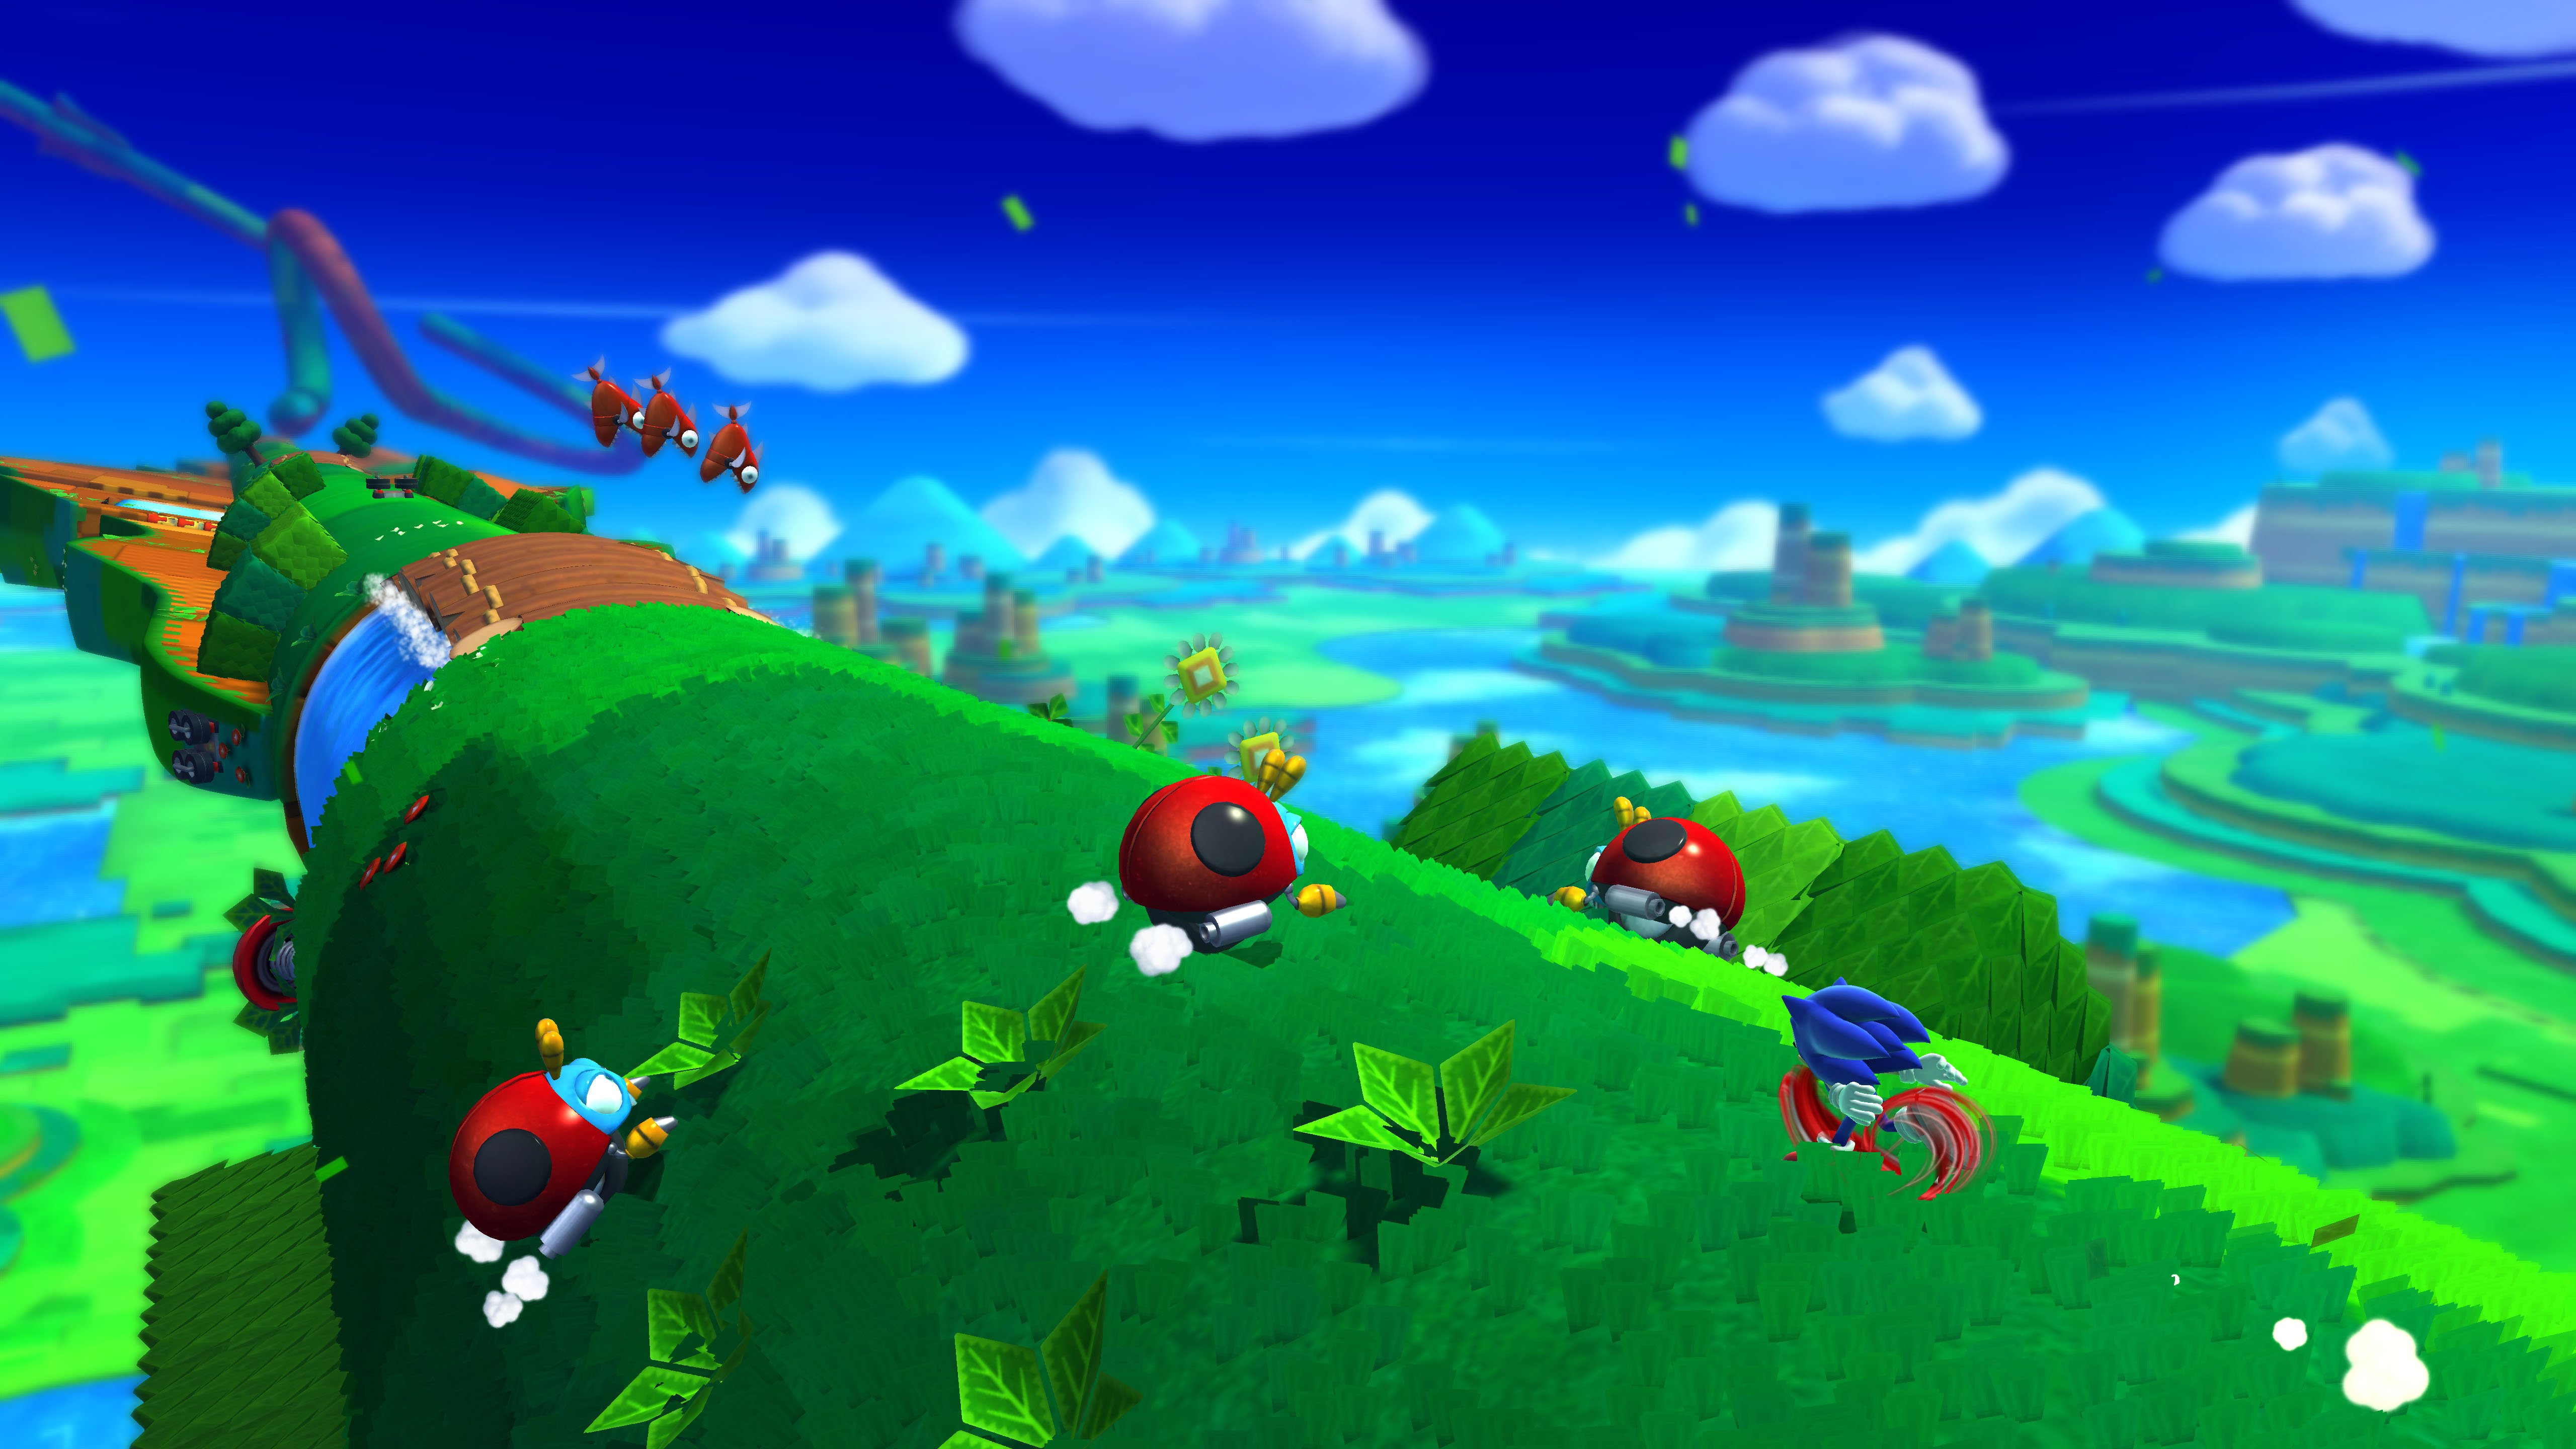 [Discussão] Sonic Lost World [Wii U/3ds] Original